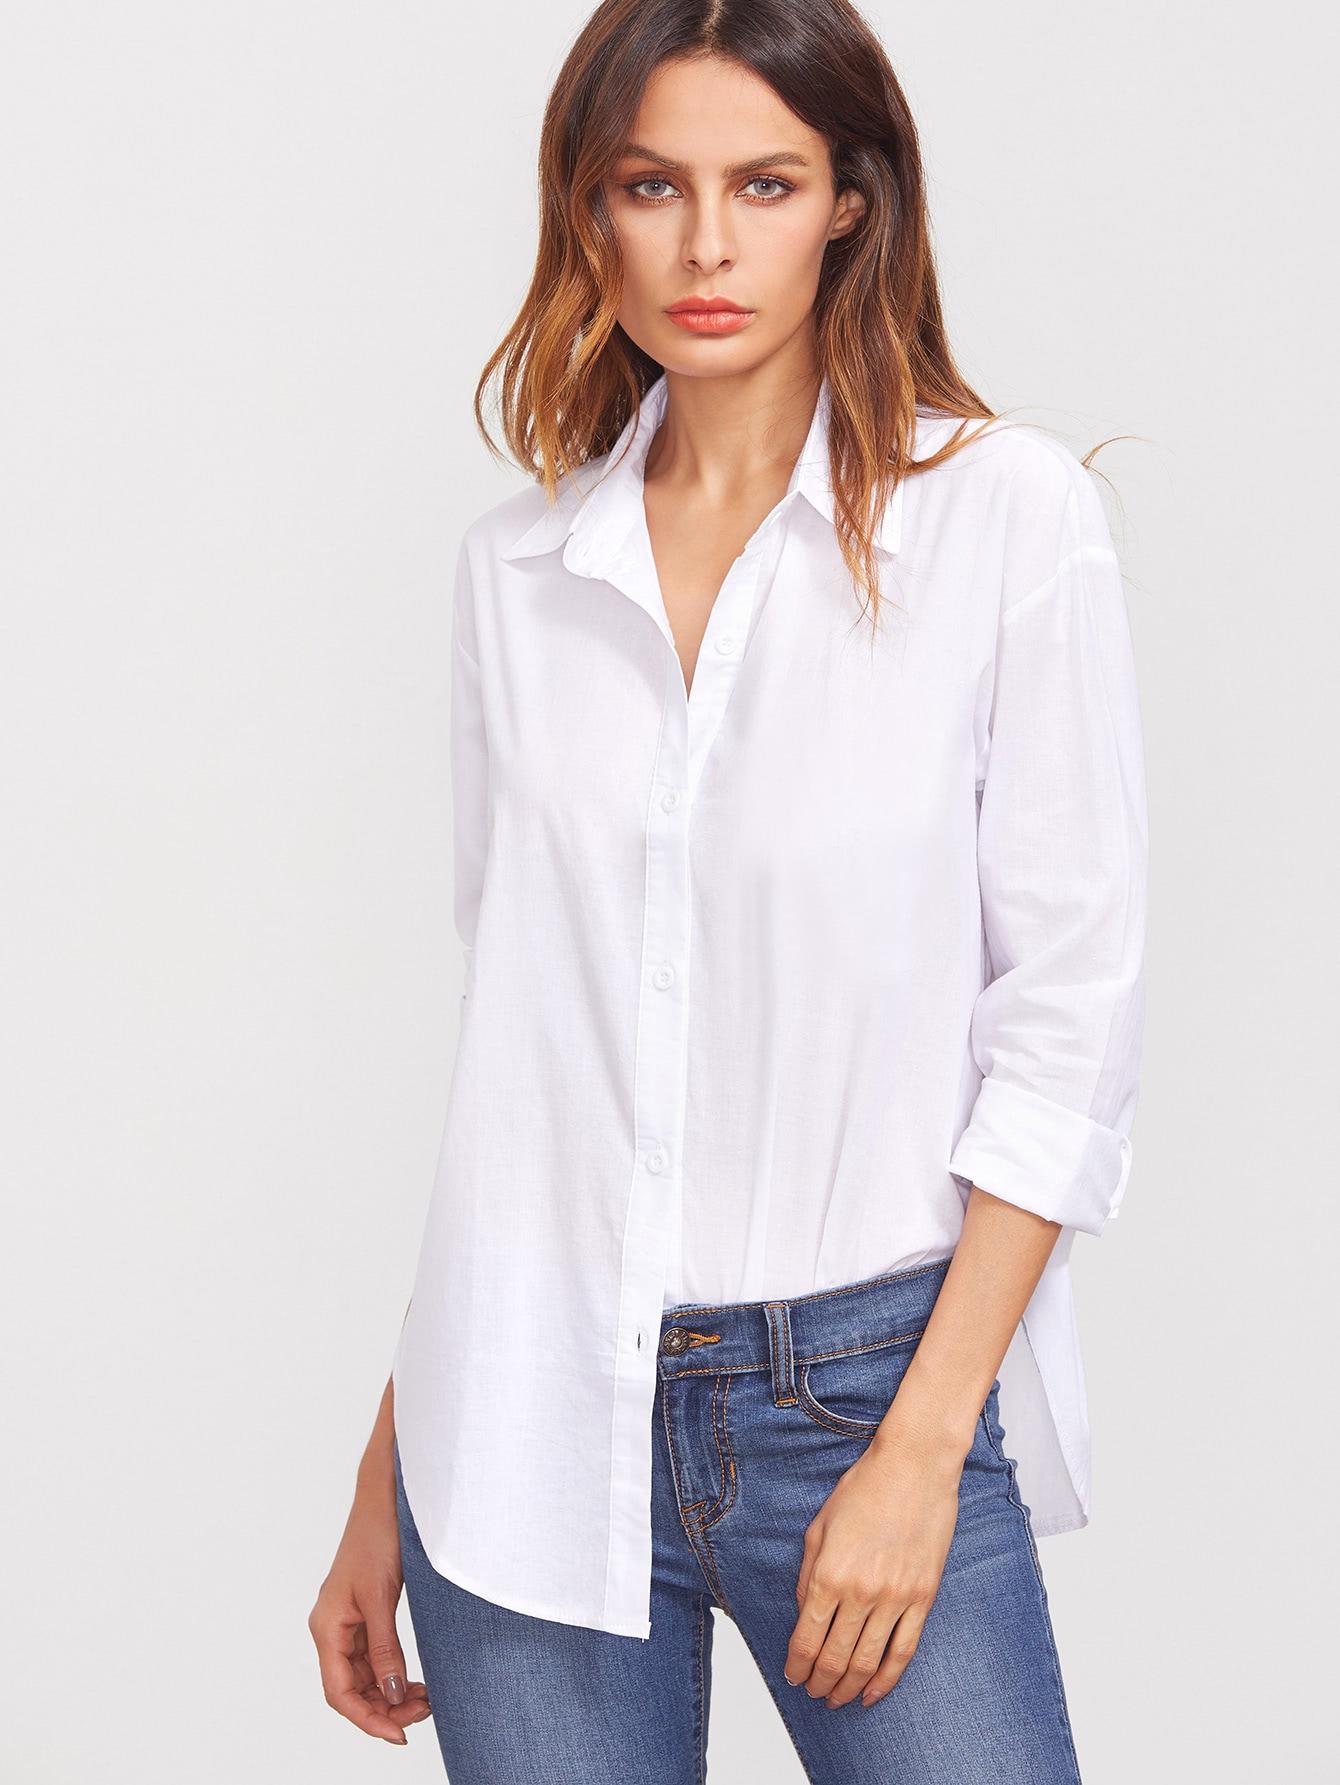 White Lapel Long Sleeve Buttons BlouseWhite Lapel Long Sleeve Buttons Blouse<br><br>color: White<br>size: L,M,S,XL